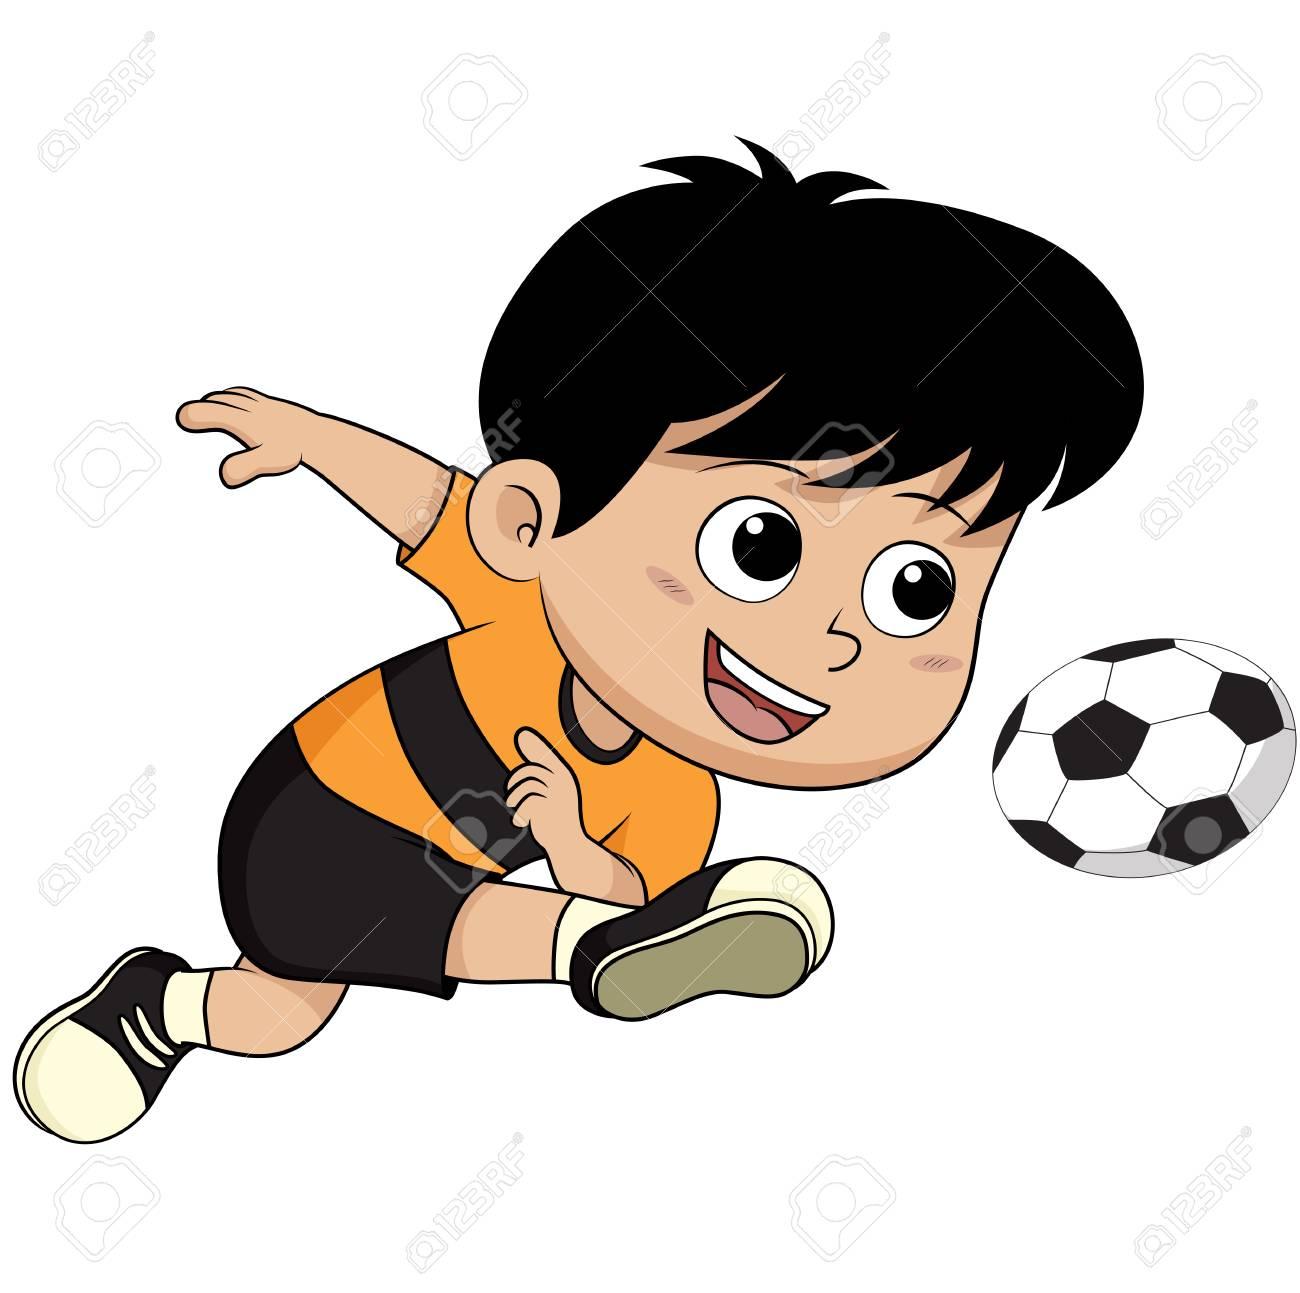 cartoon soccer kid vector and illustration royalty free cliparts rh 123rf com soccer goal cartoon images funny soccer cartoon images